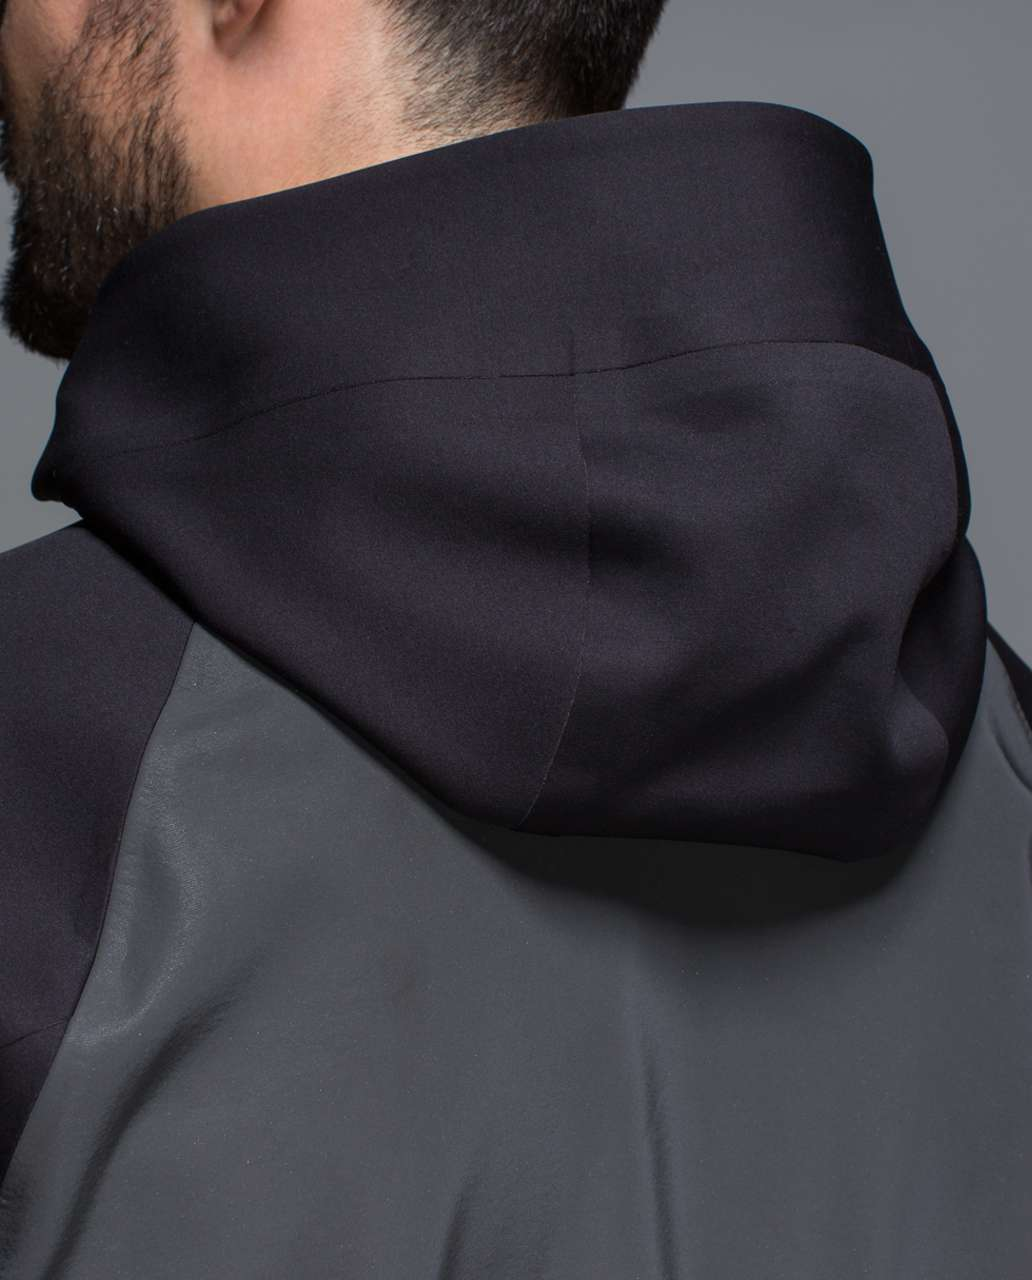 Lululemon Chamber Hoodie *Reflective - Black